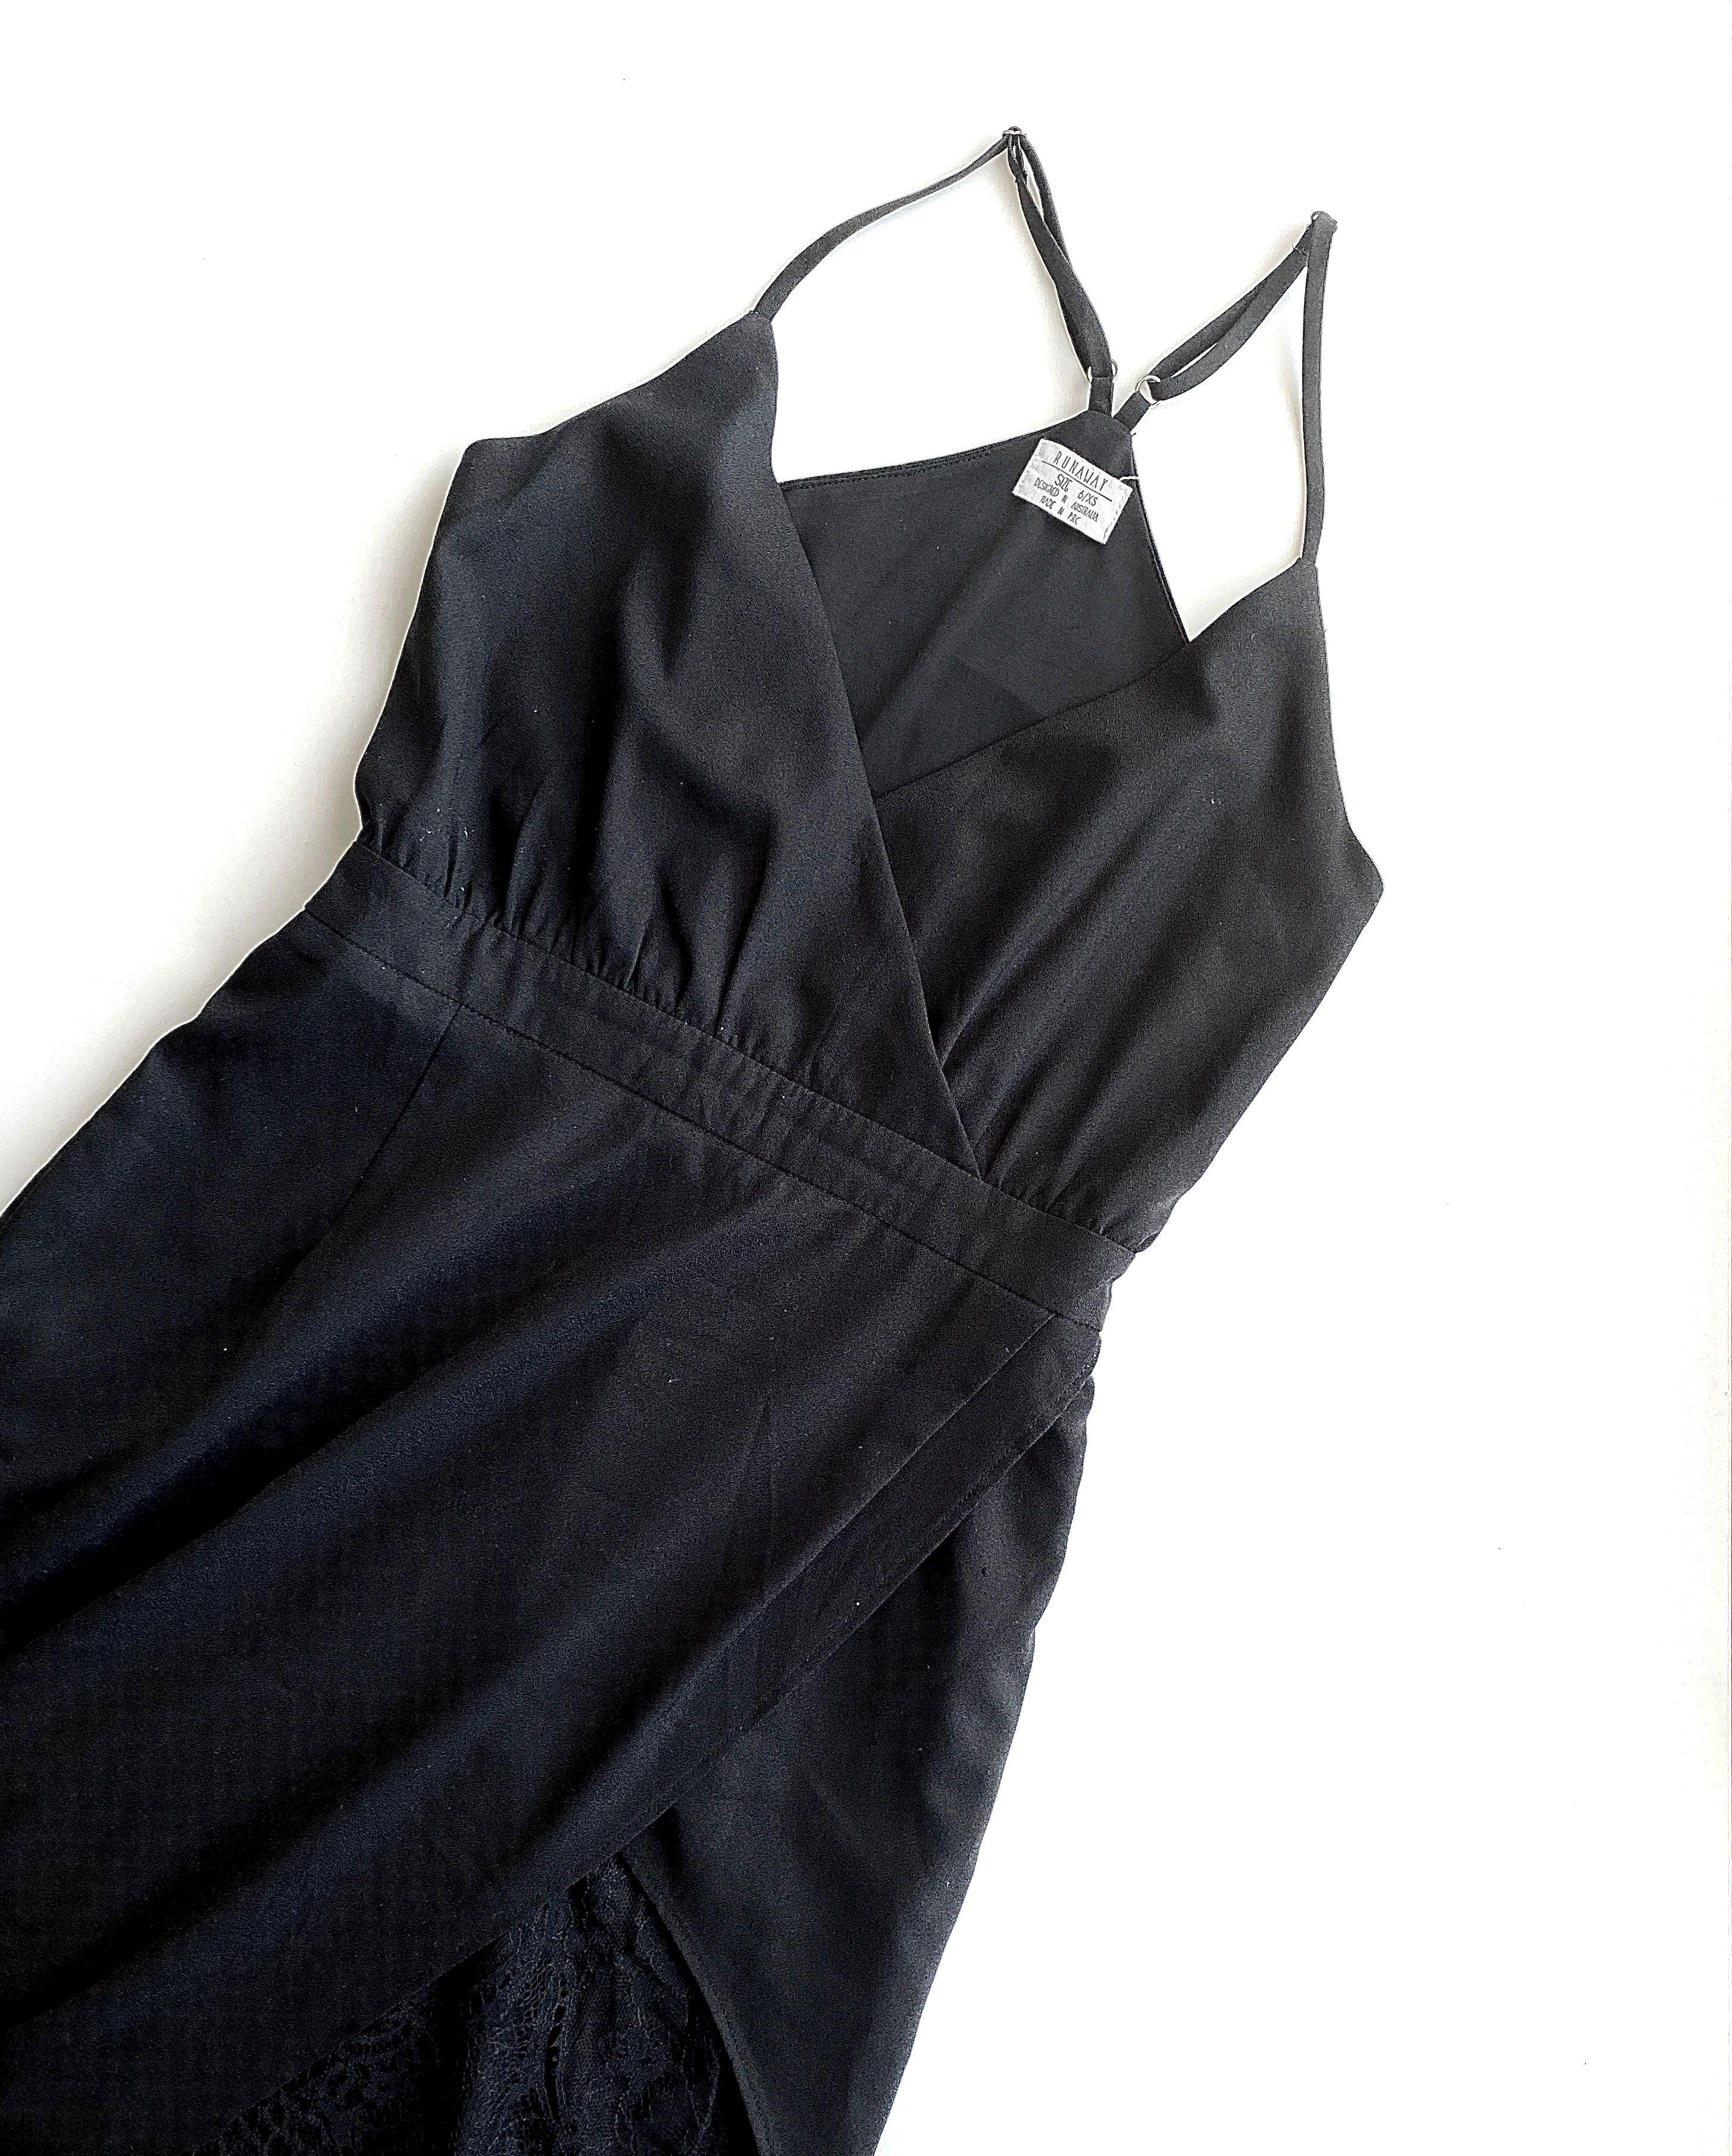 Black laced evening dress size 6-8 XS